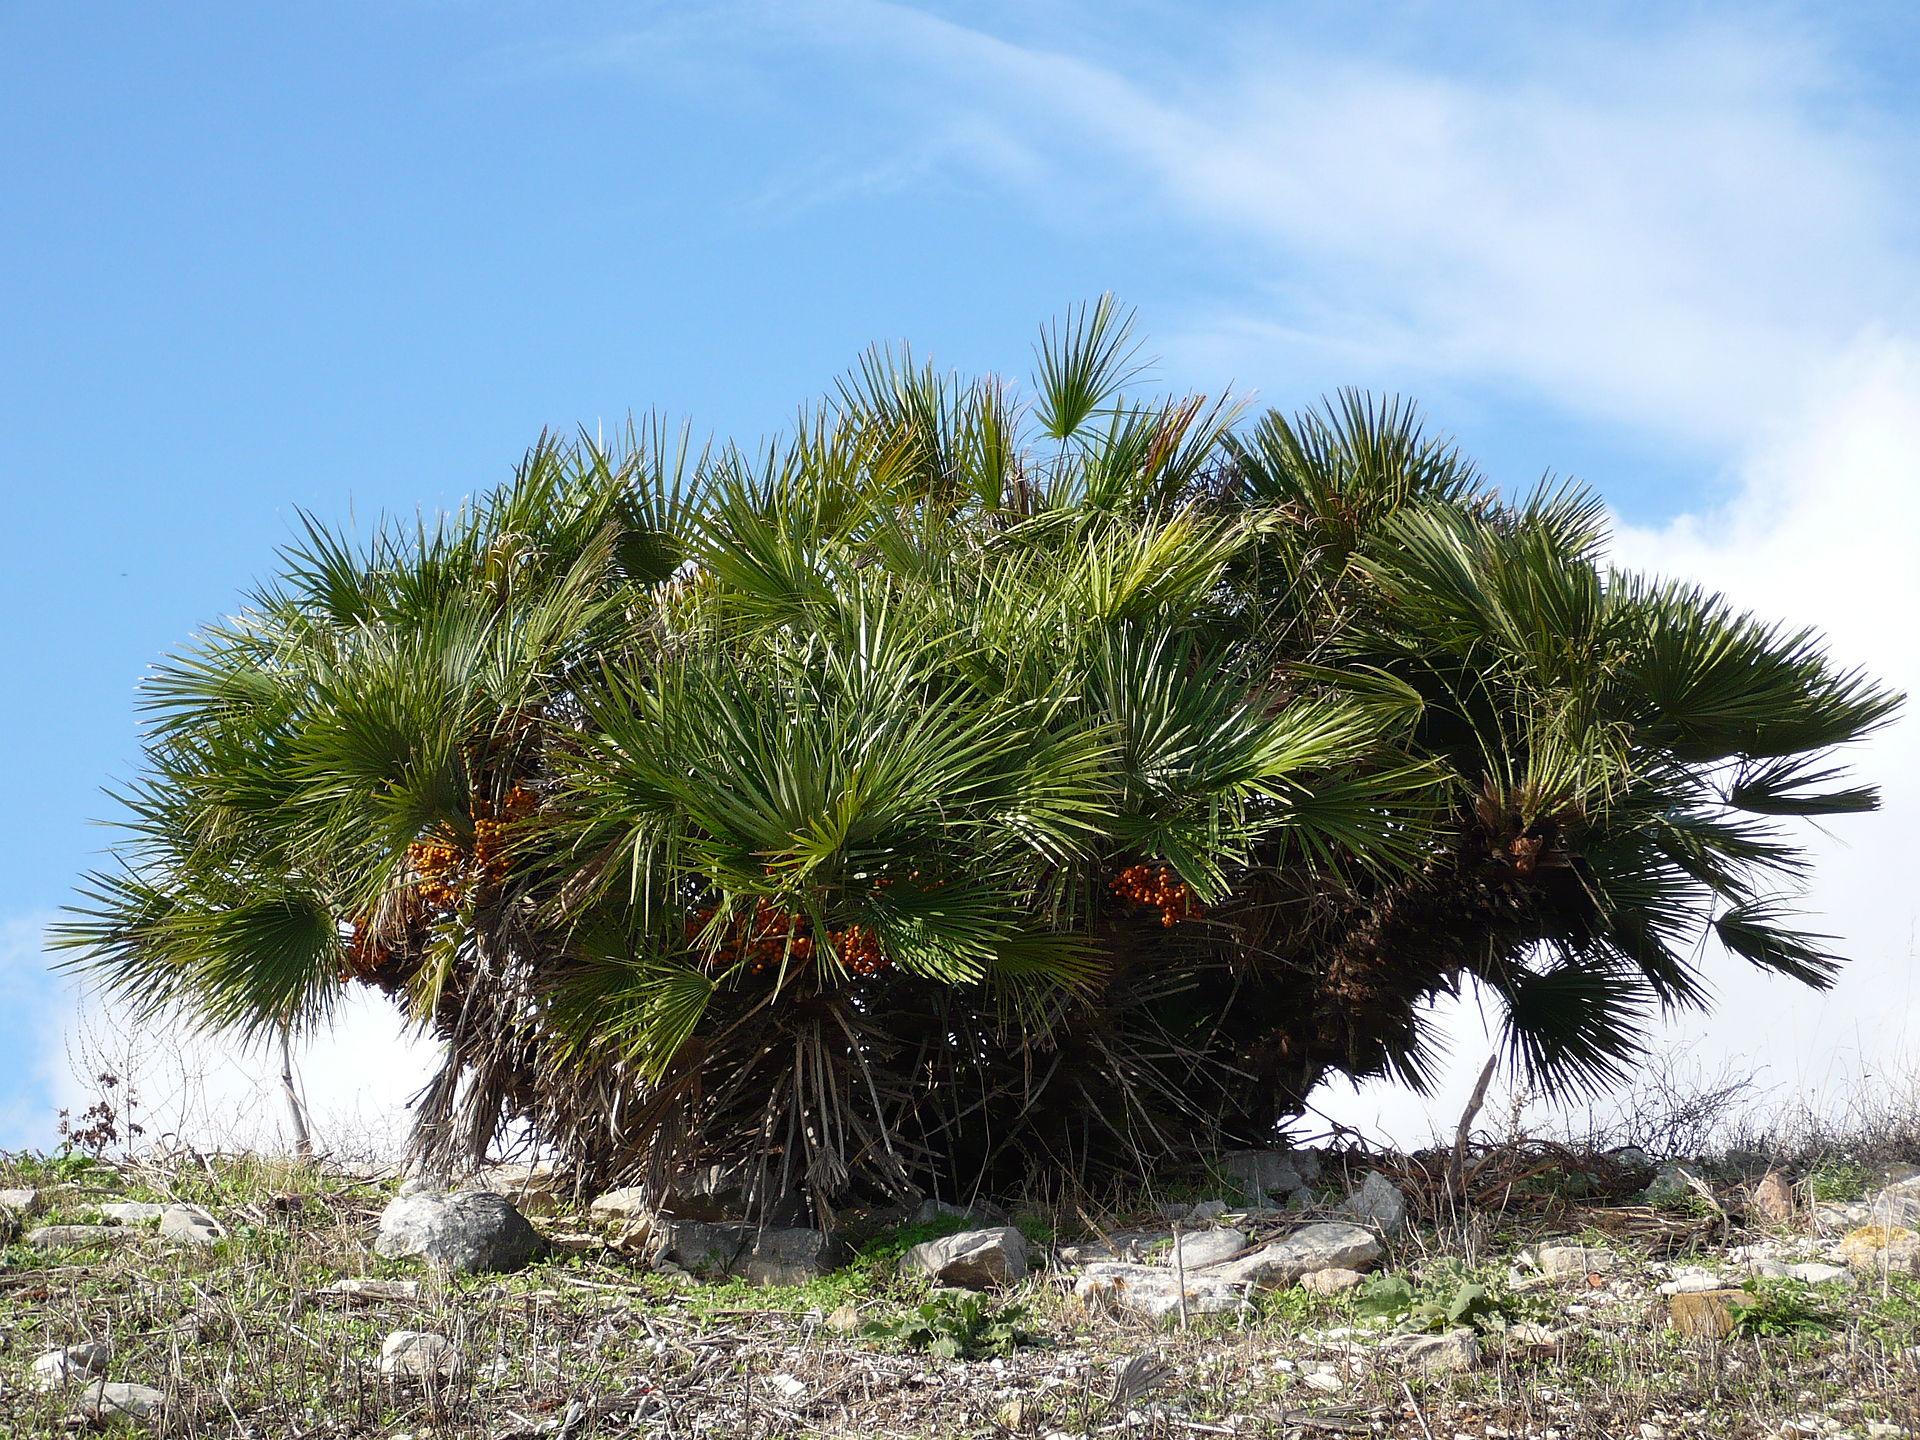 Chamaerops Humilis Wikimedia Commons